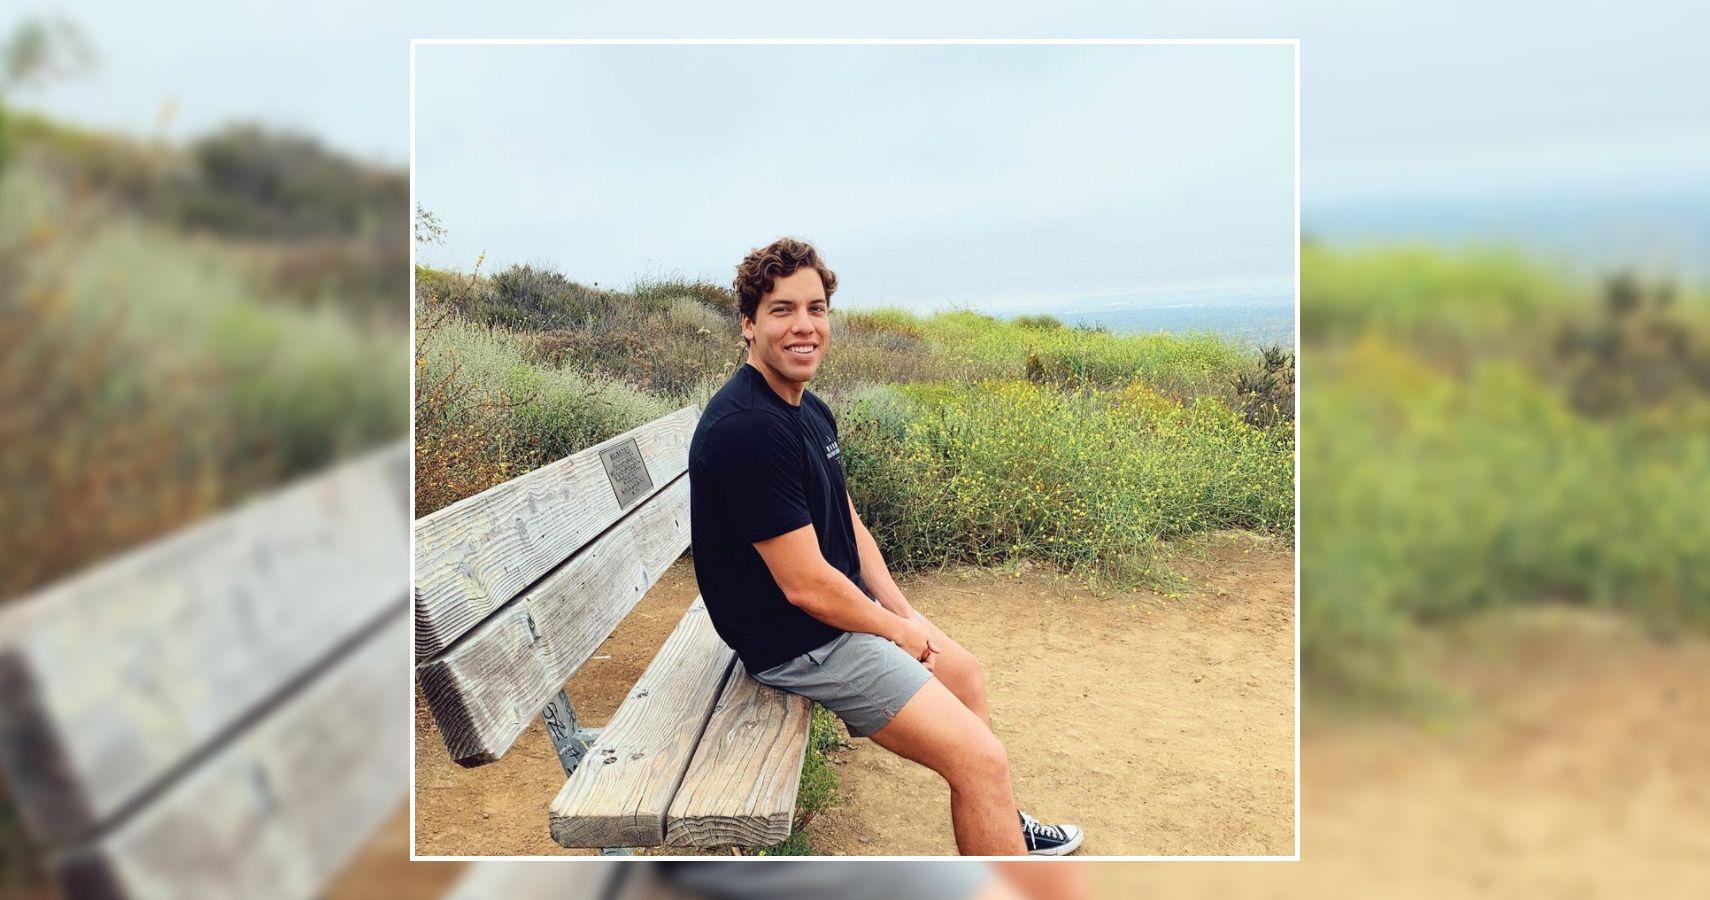 Joseph Baena Siblings: Are They Close? | Moms.com